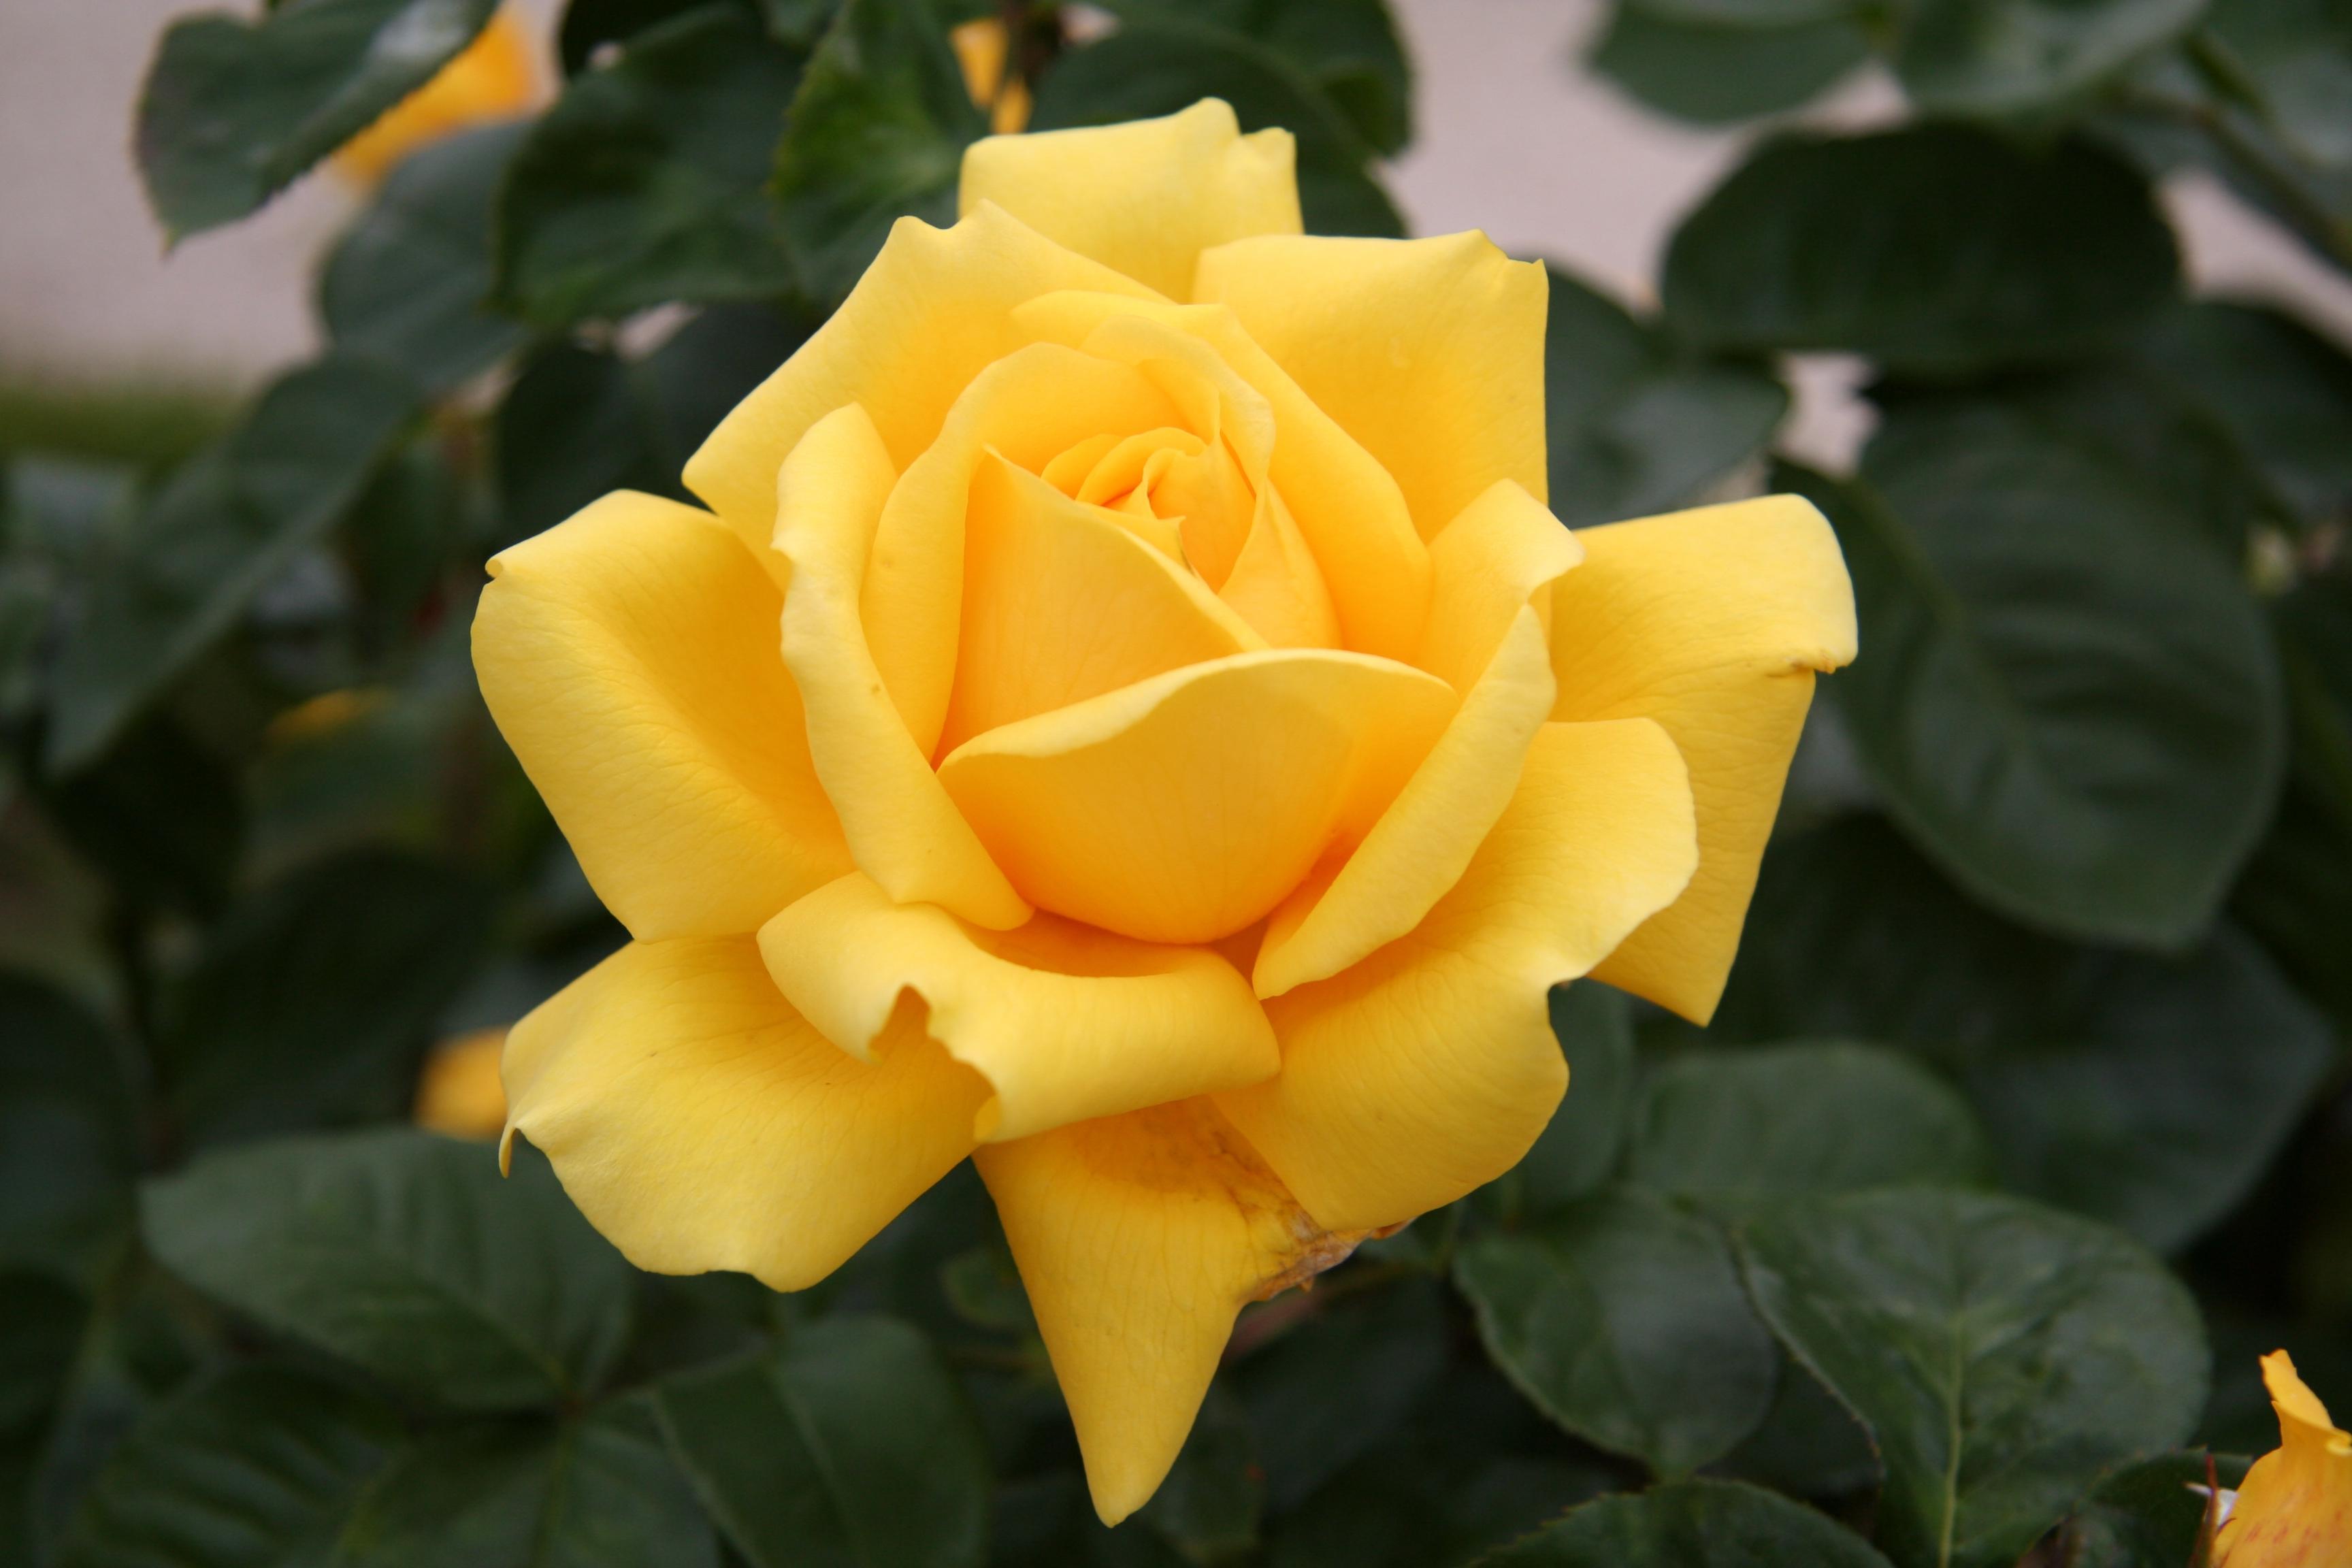 Yellow rose full hd - Yellow rose images hd ...